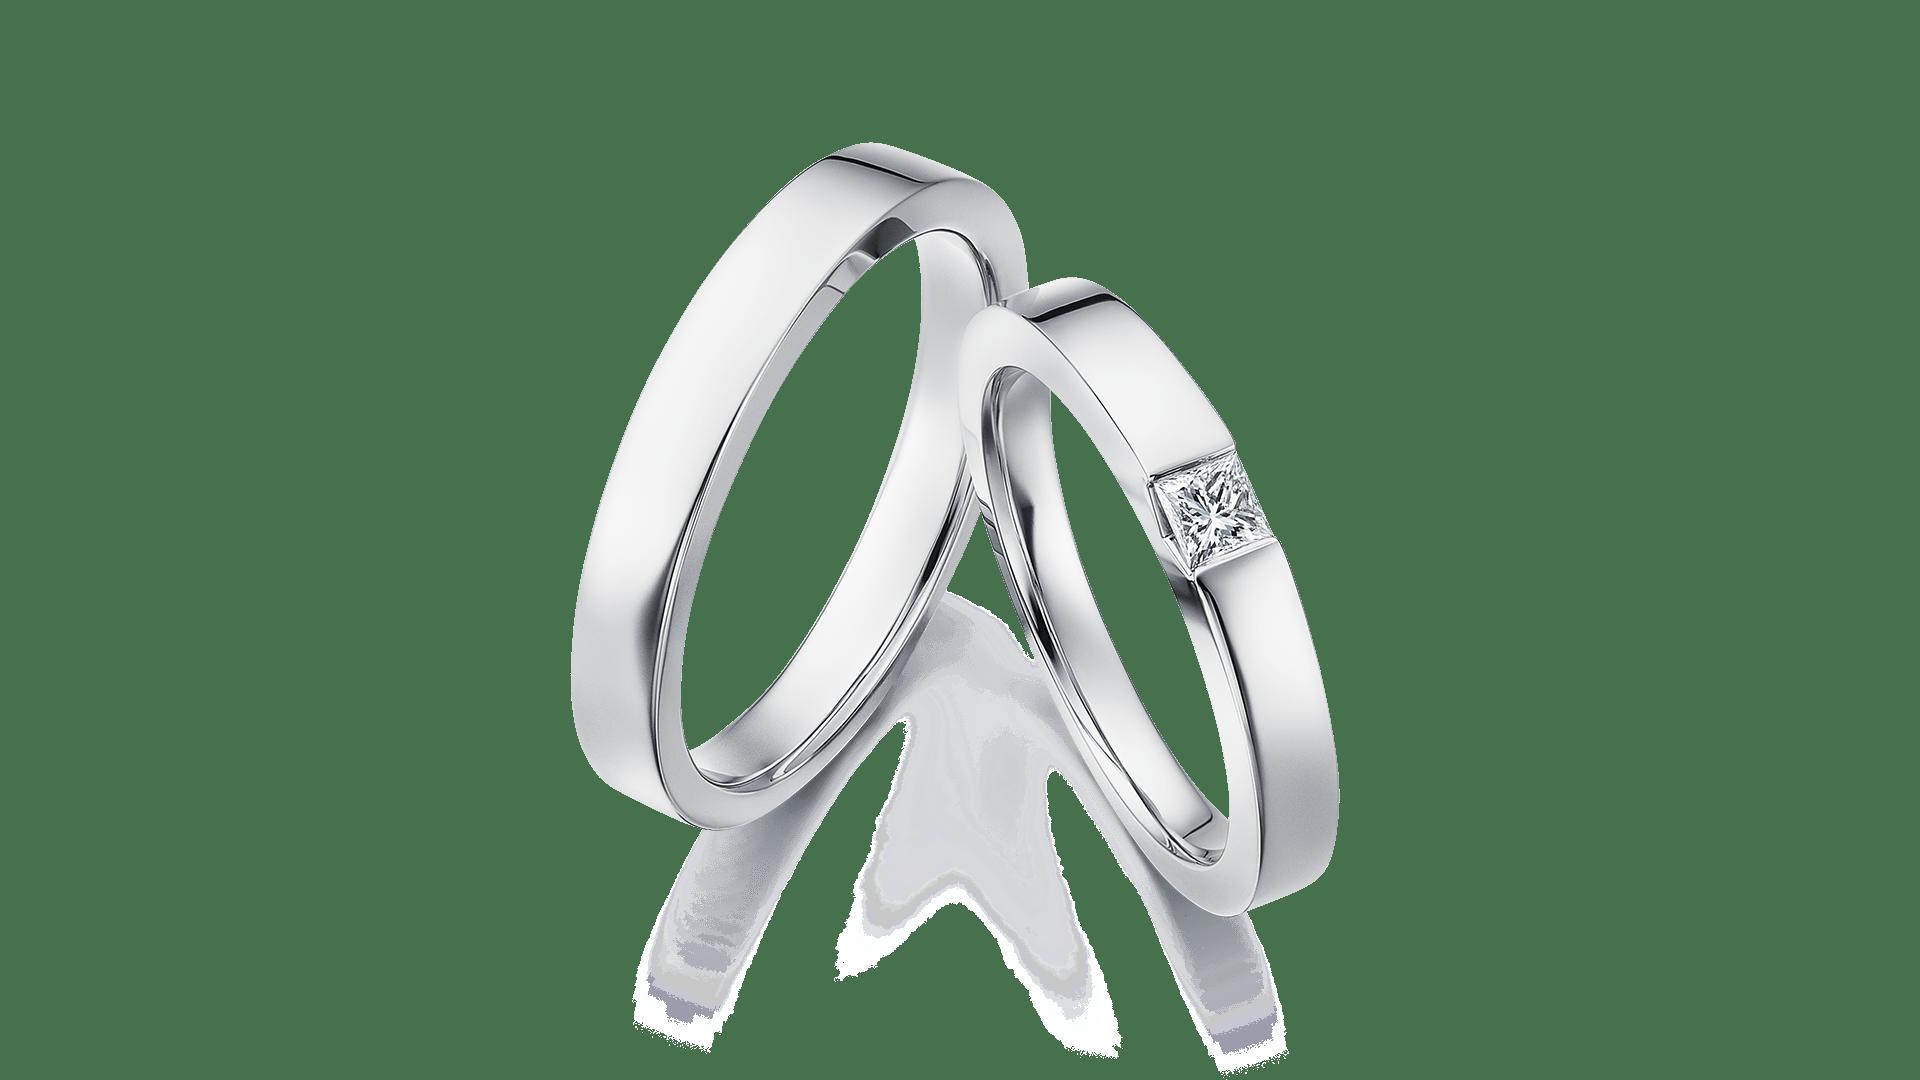 philia フィリア | 結婚指輪サムネイル 2